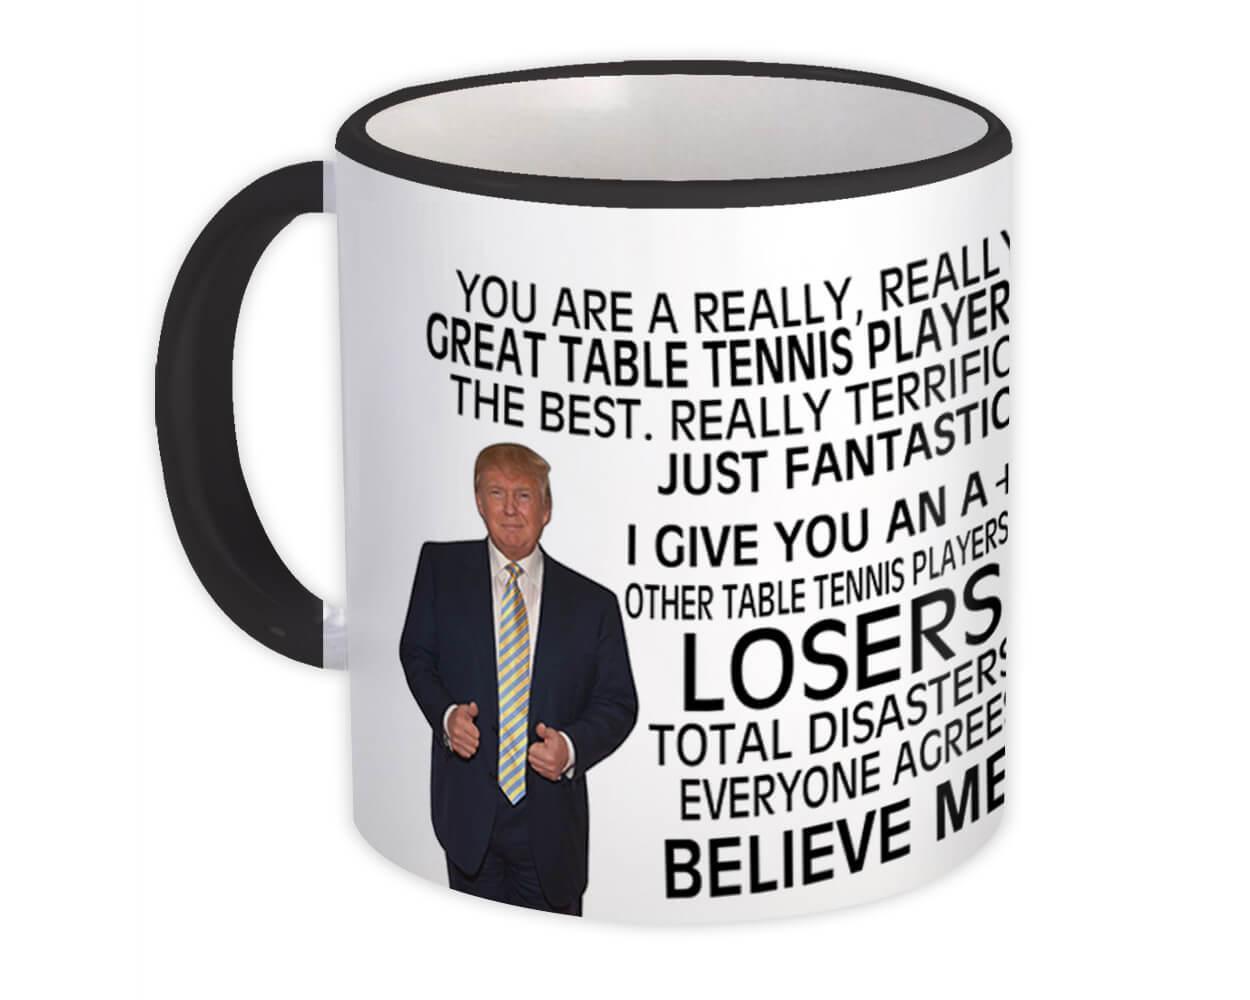 Gift for Table Tennis Player : Gift Mug Donald Trump Great Table Tennis Player Funny Christmas